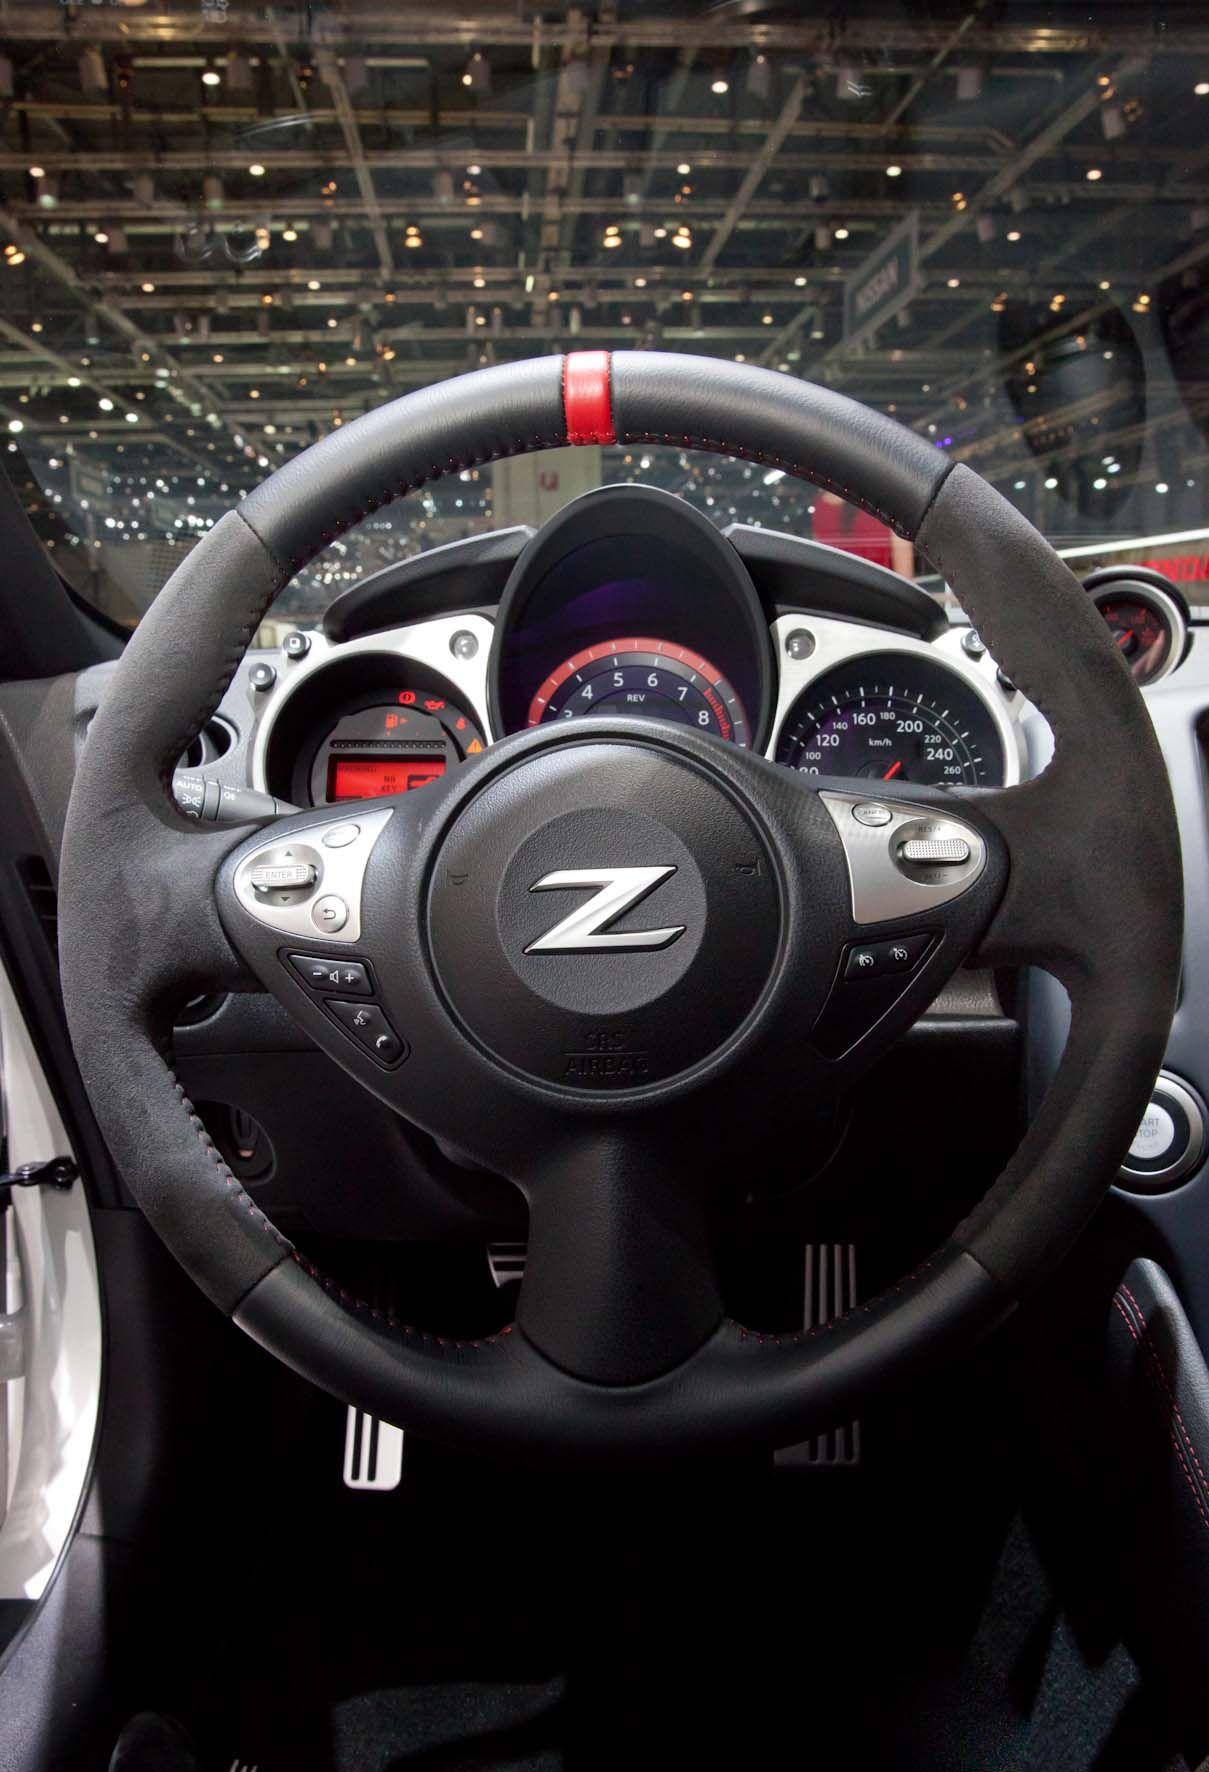 nissan 370z steering wheel in alcantara gvamotorshow alcantaraspa nissan 370z steering wheel in